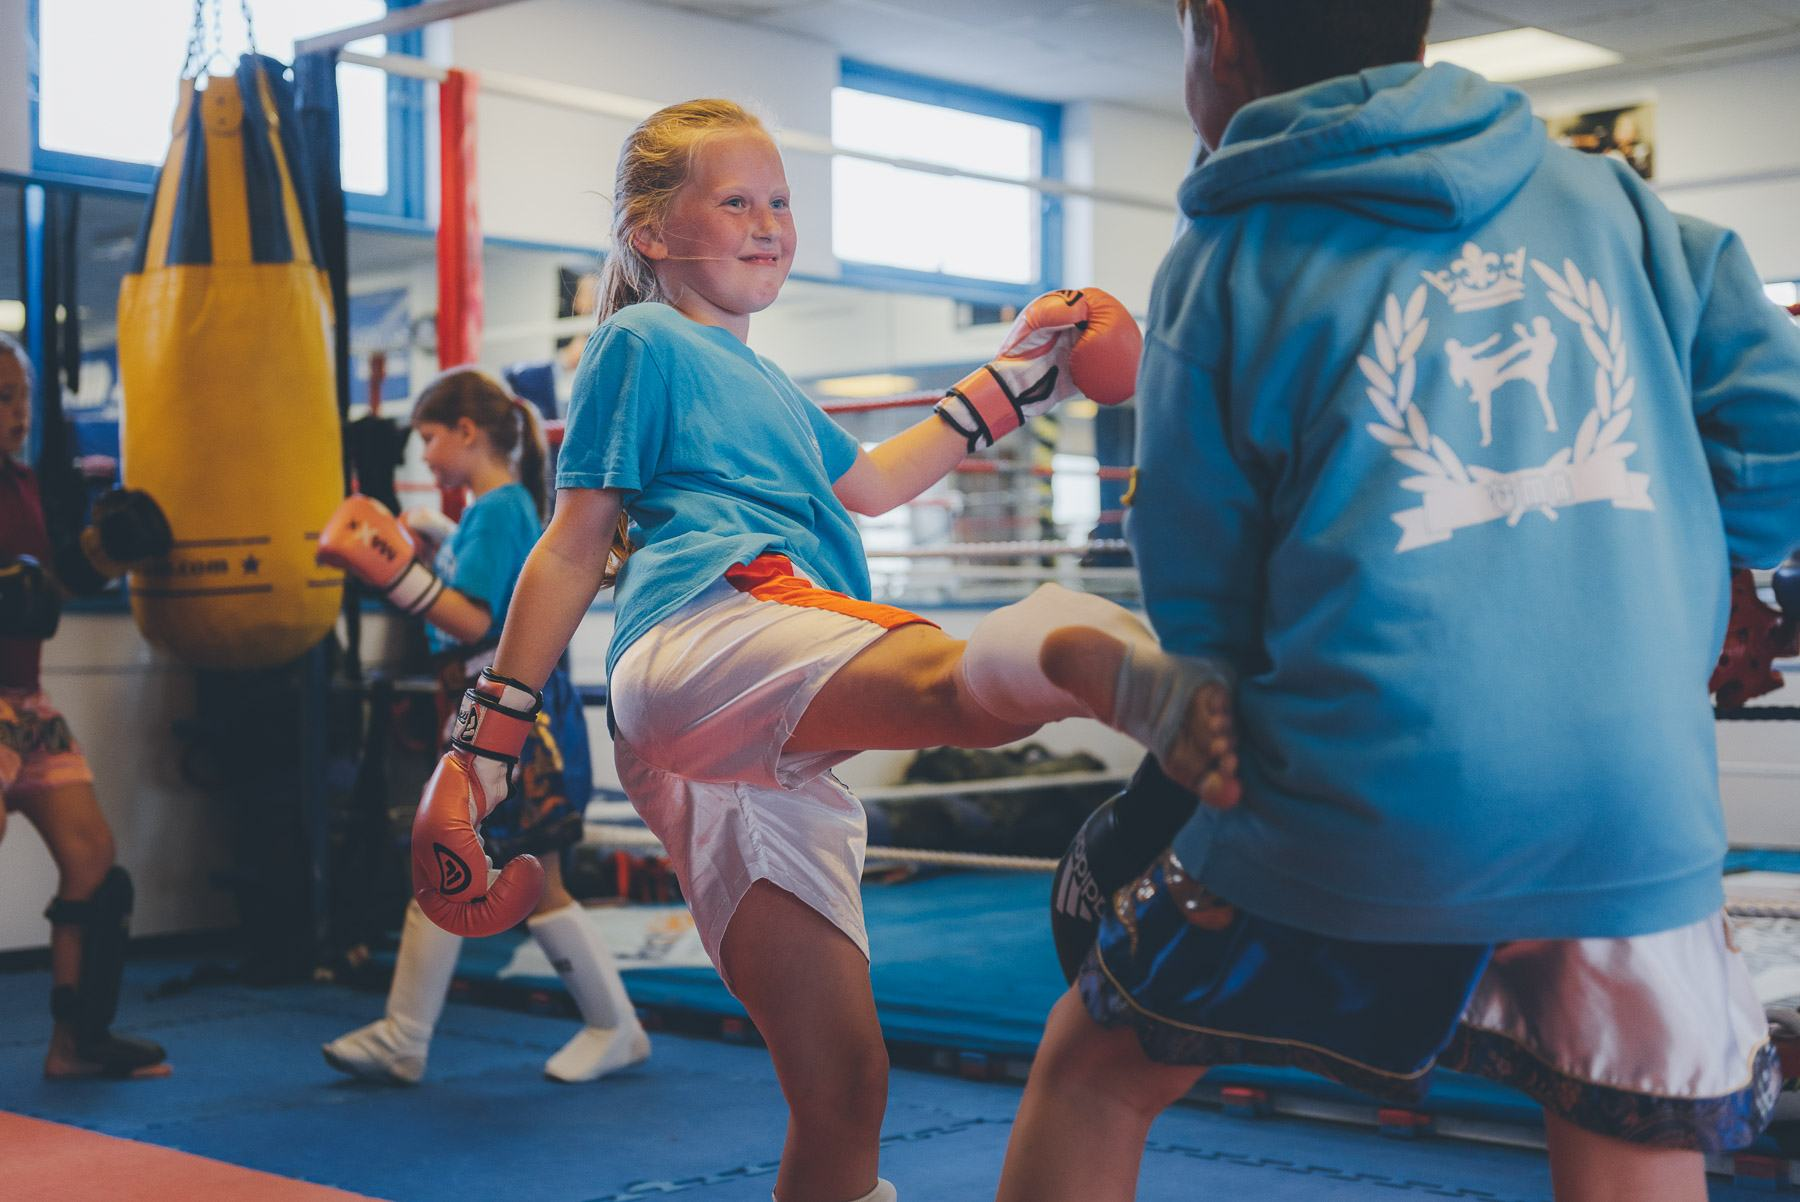 kids martial arts classes near me